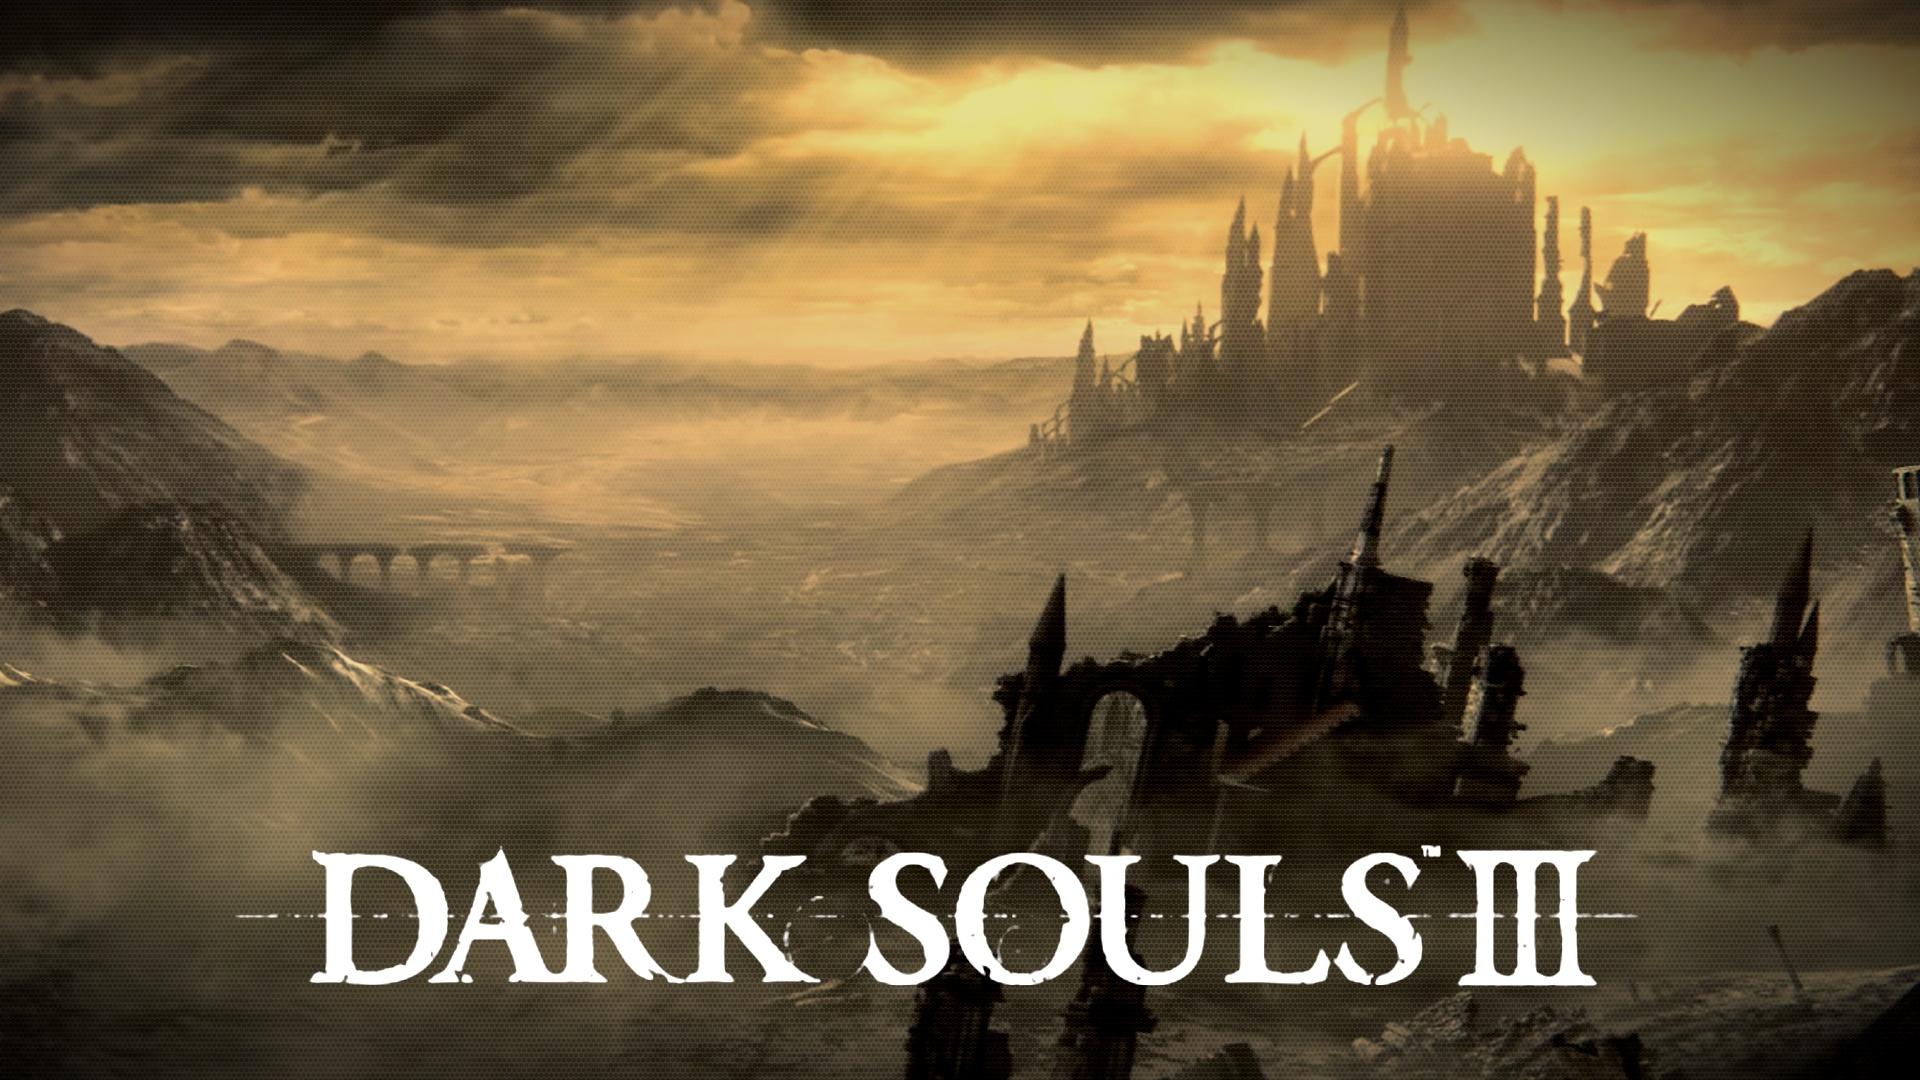 Dark Souls 2 Wallpaper Hd: Dark Souls 3 Wallpapers, Pictures, Images